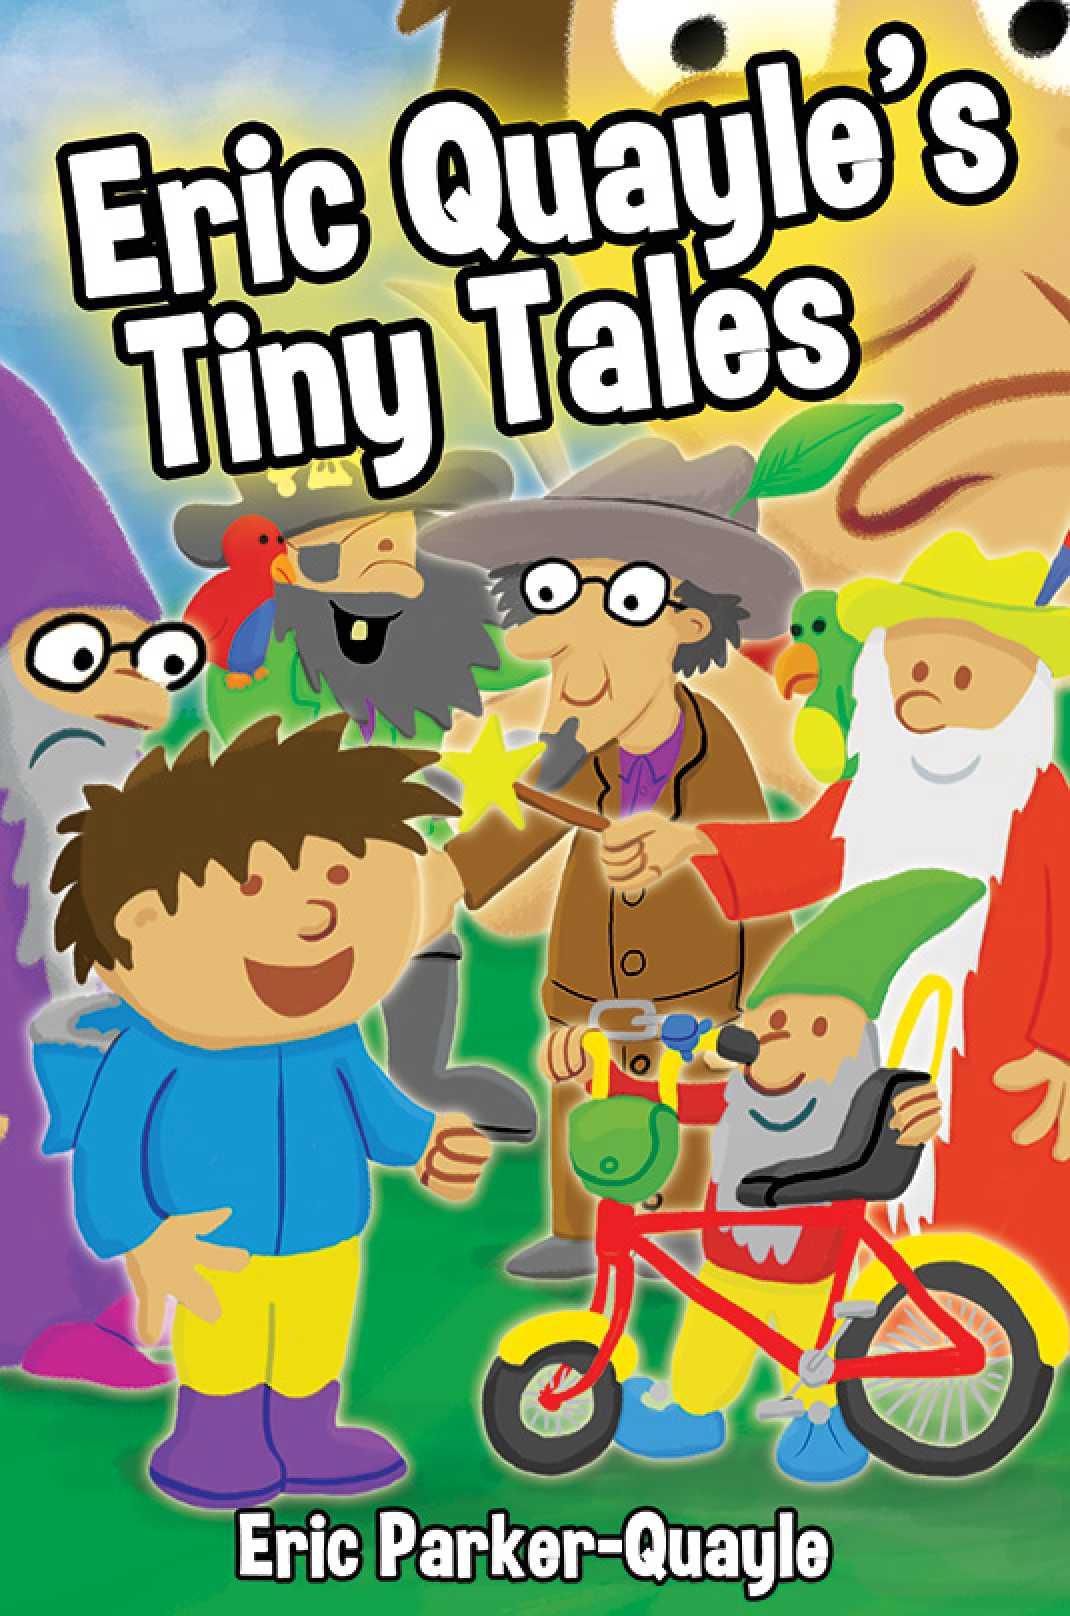 Eric Quayle's Tiny Tales